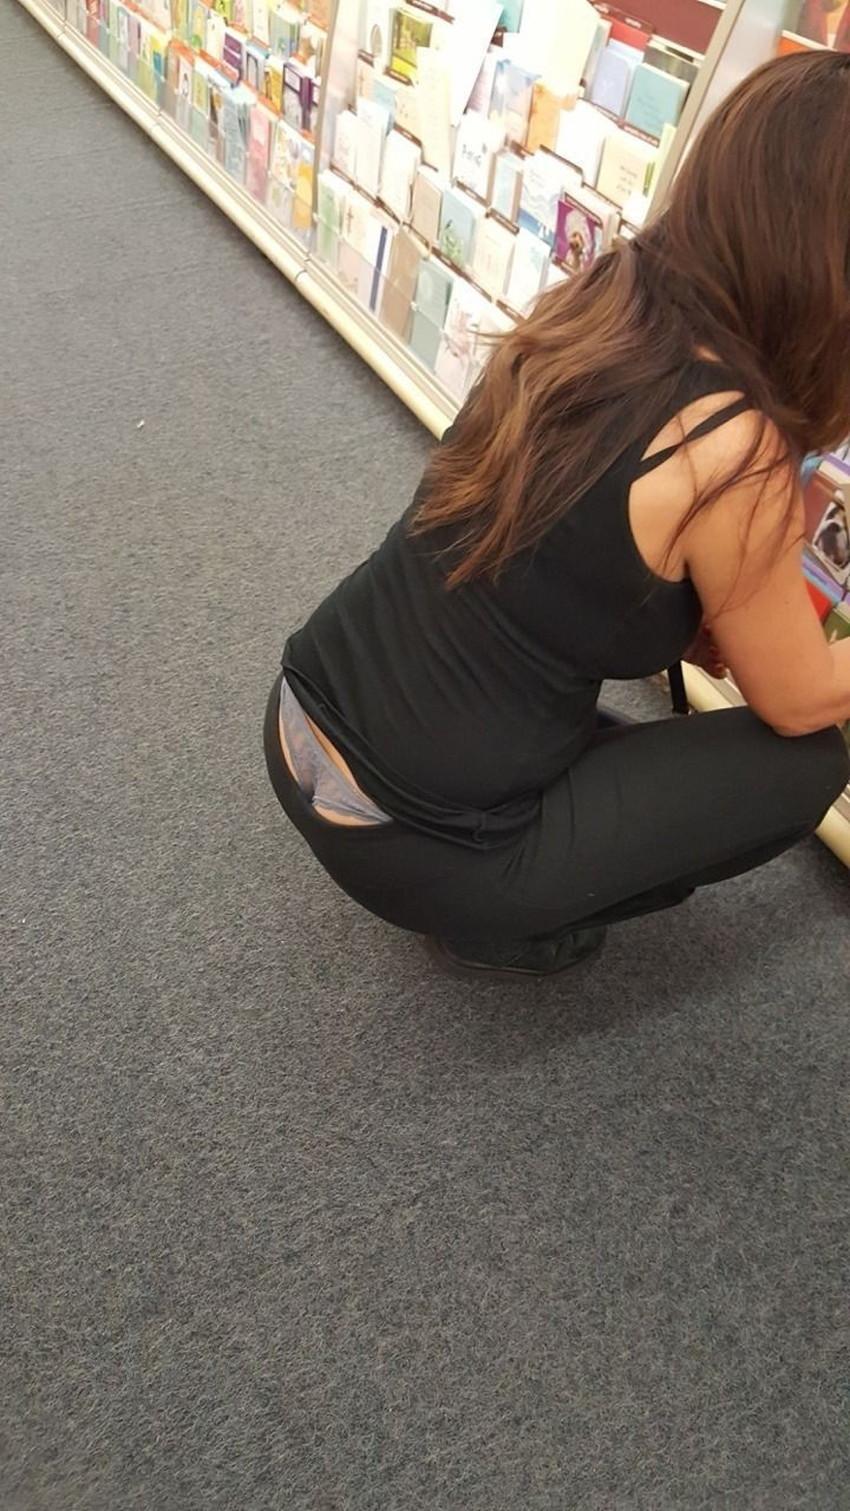 【Tバックハミパンエロ画像】美女のハミパン覗いたらTバックだったというラッキー過ぎるTバックハミパンのエロ画像集!ww【80枚】 64